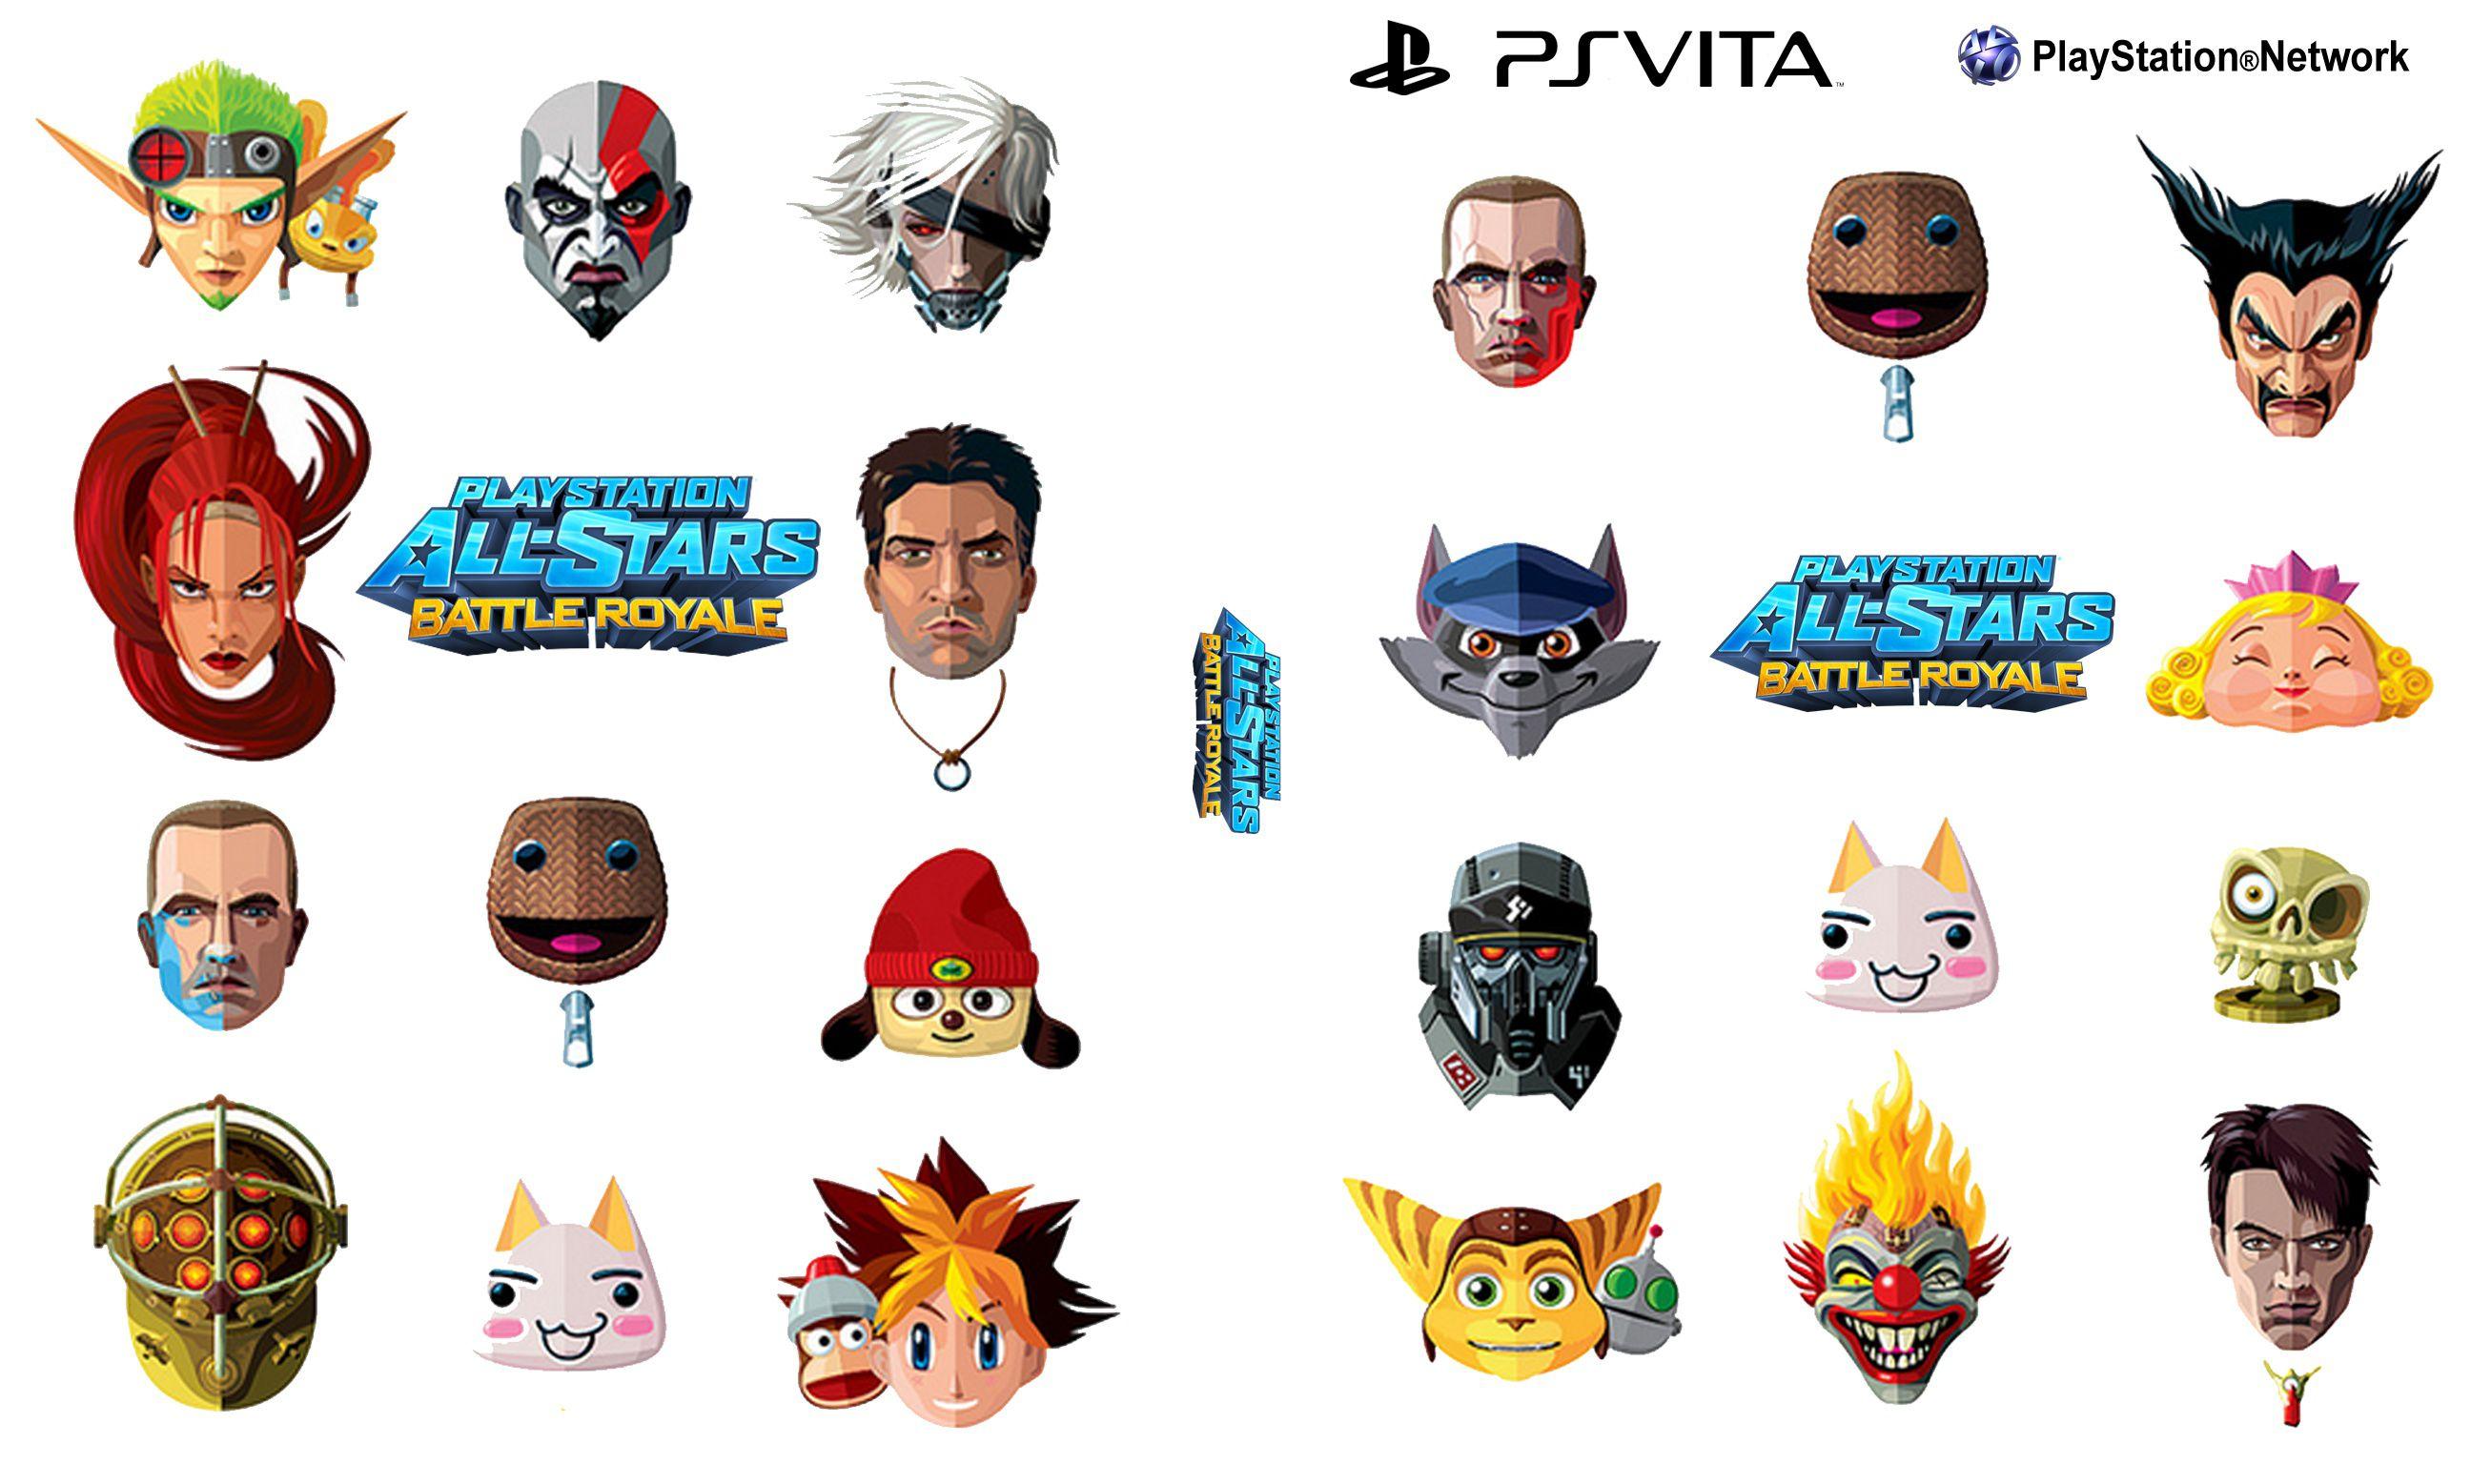 Capa Playstation All-Stars Battle Royale PS Vita